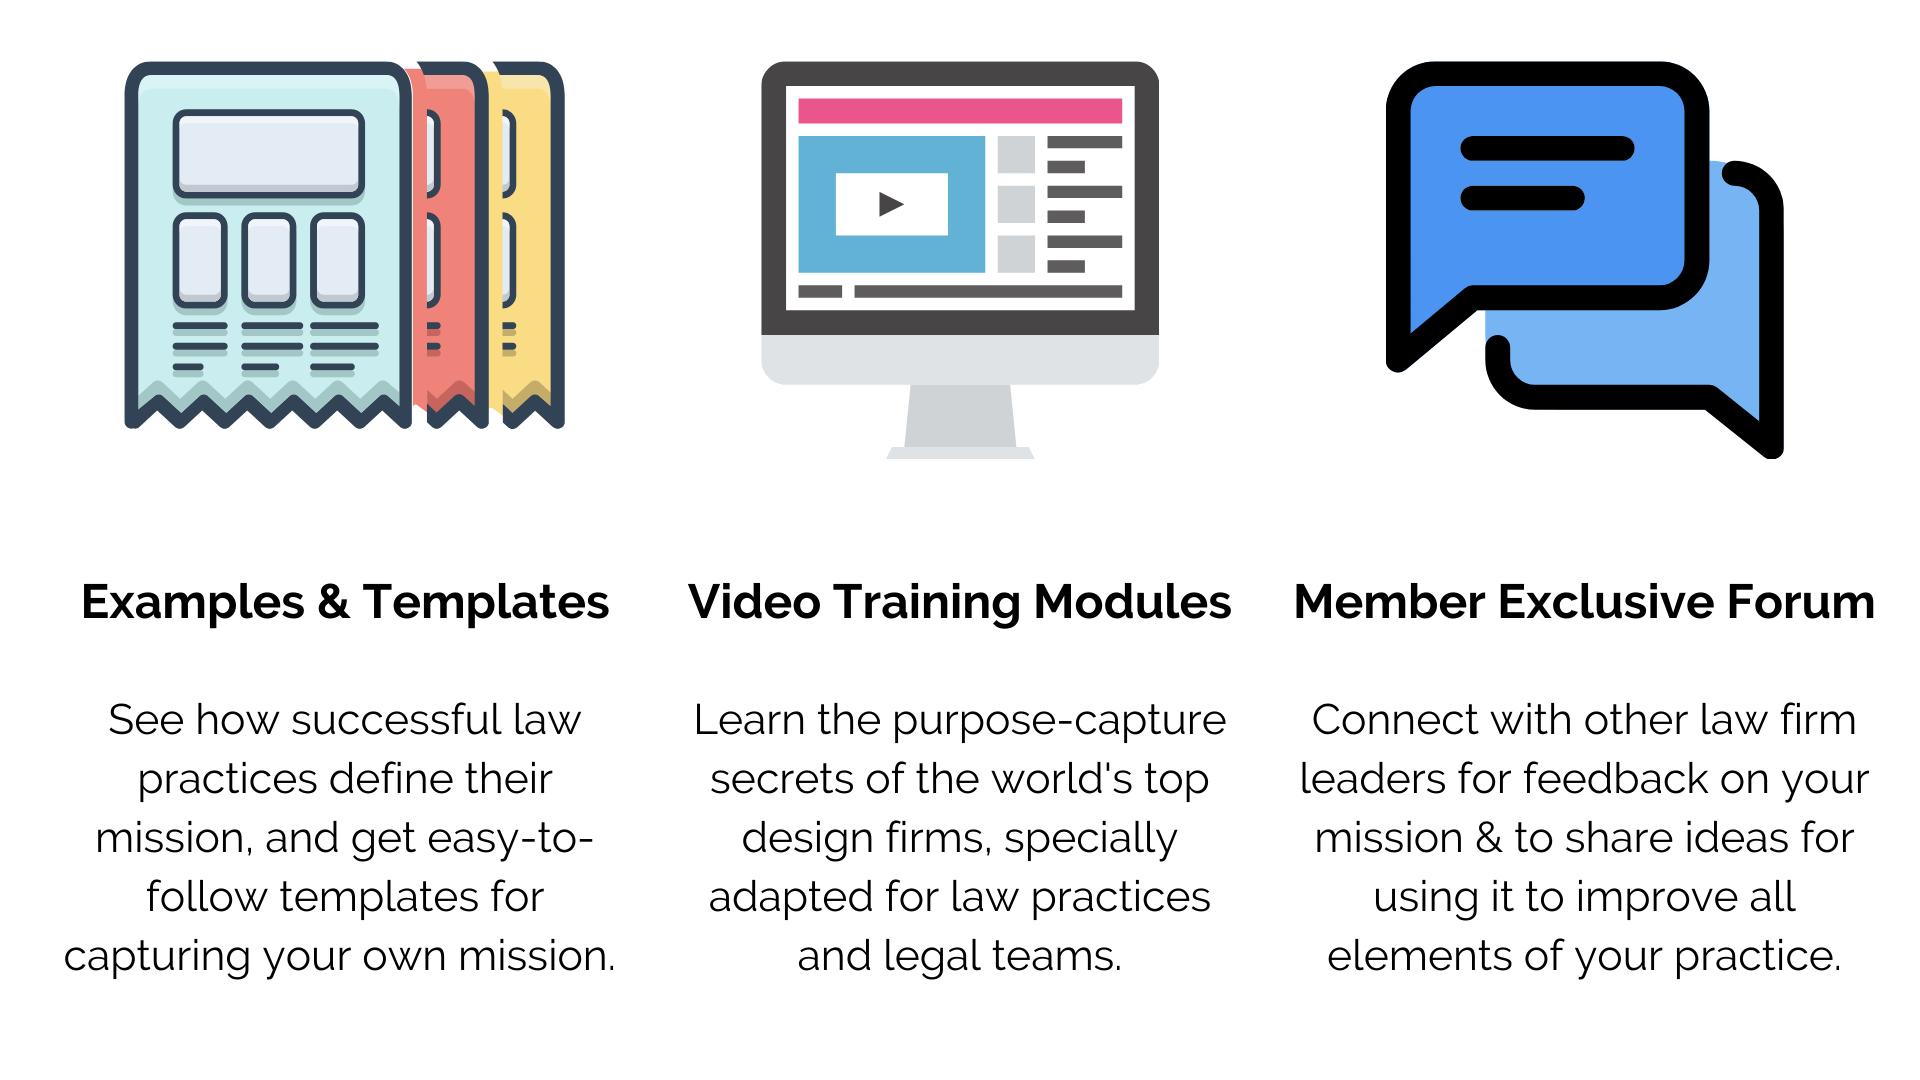 Examples & Templates, Video Training Modules, Member Exclusive Forum